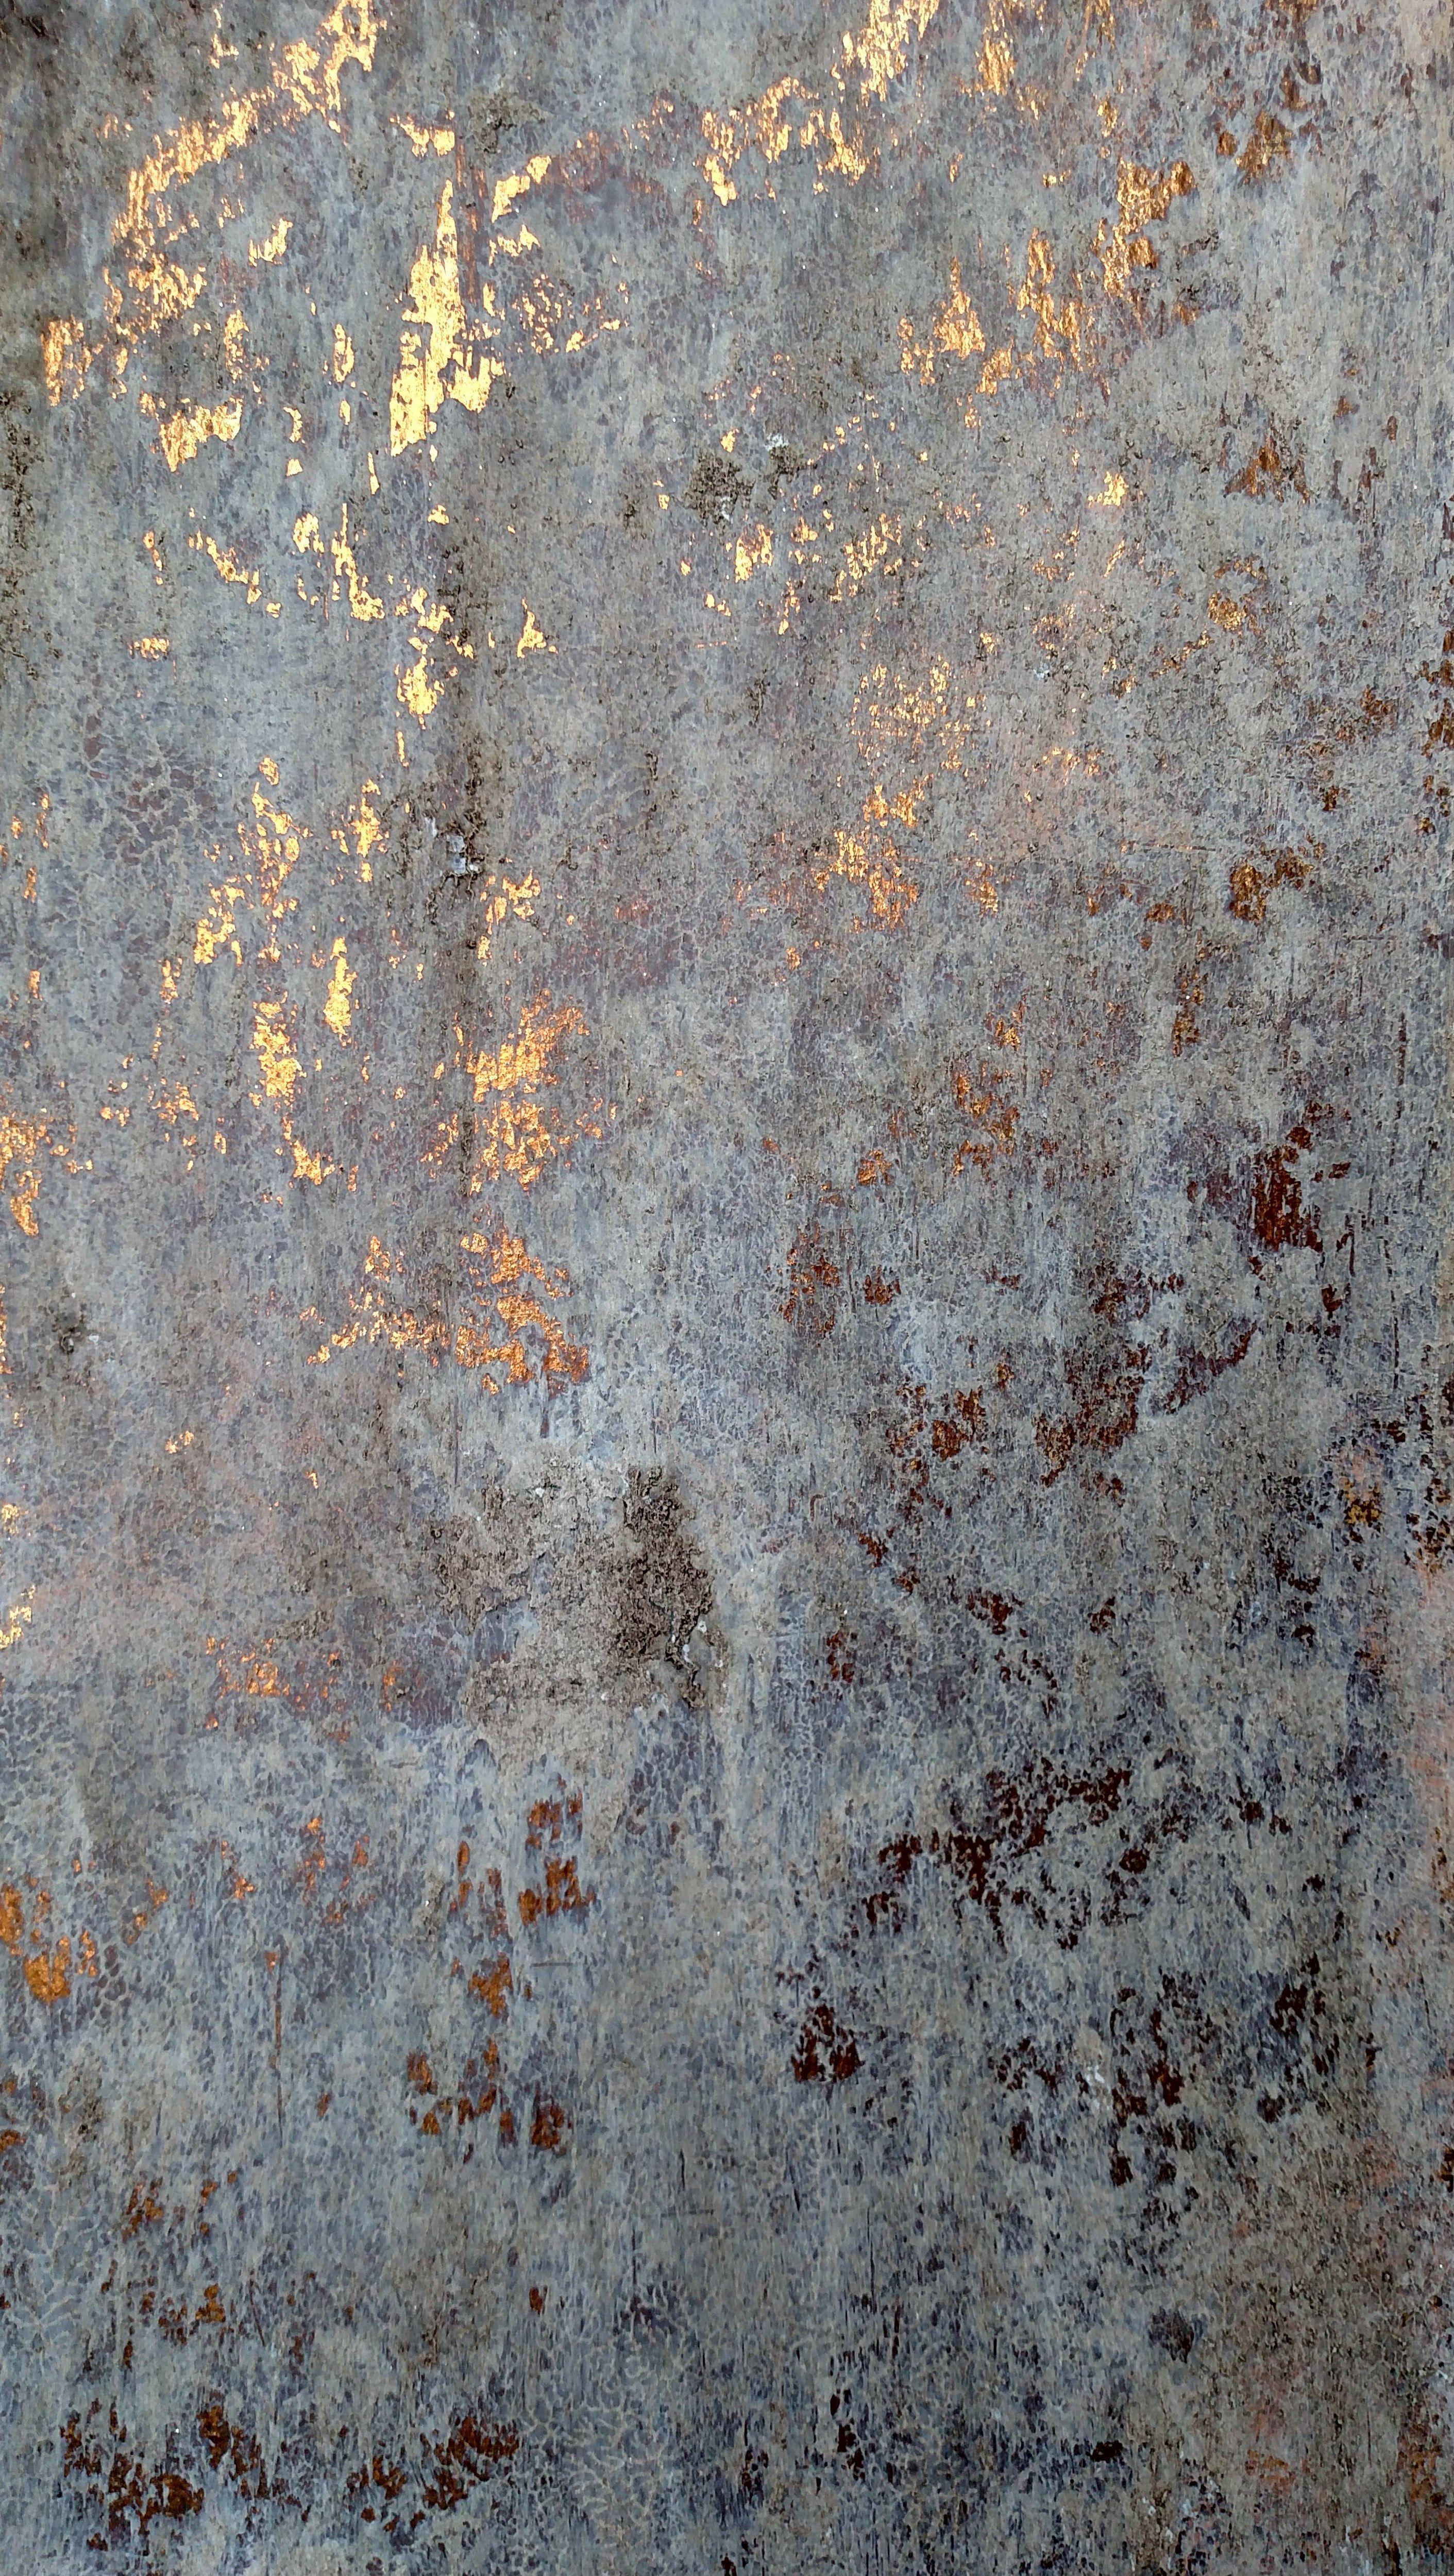 Rustic Metal Iphone Wallpapers Top Free Rustic Metal